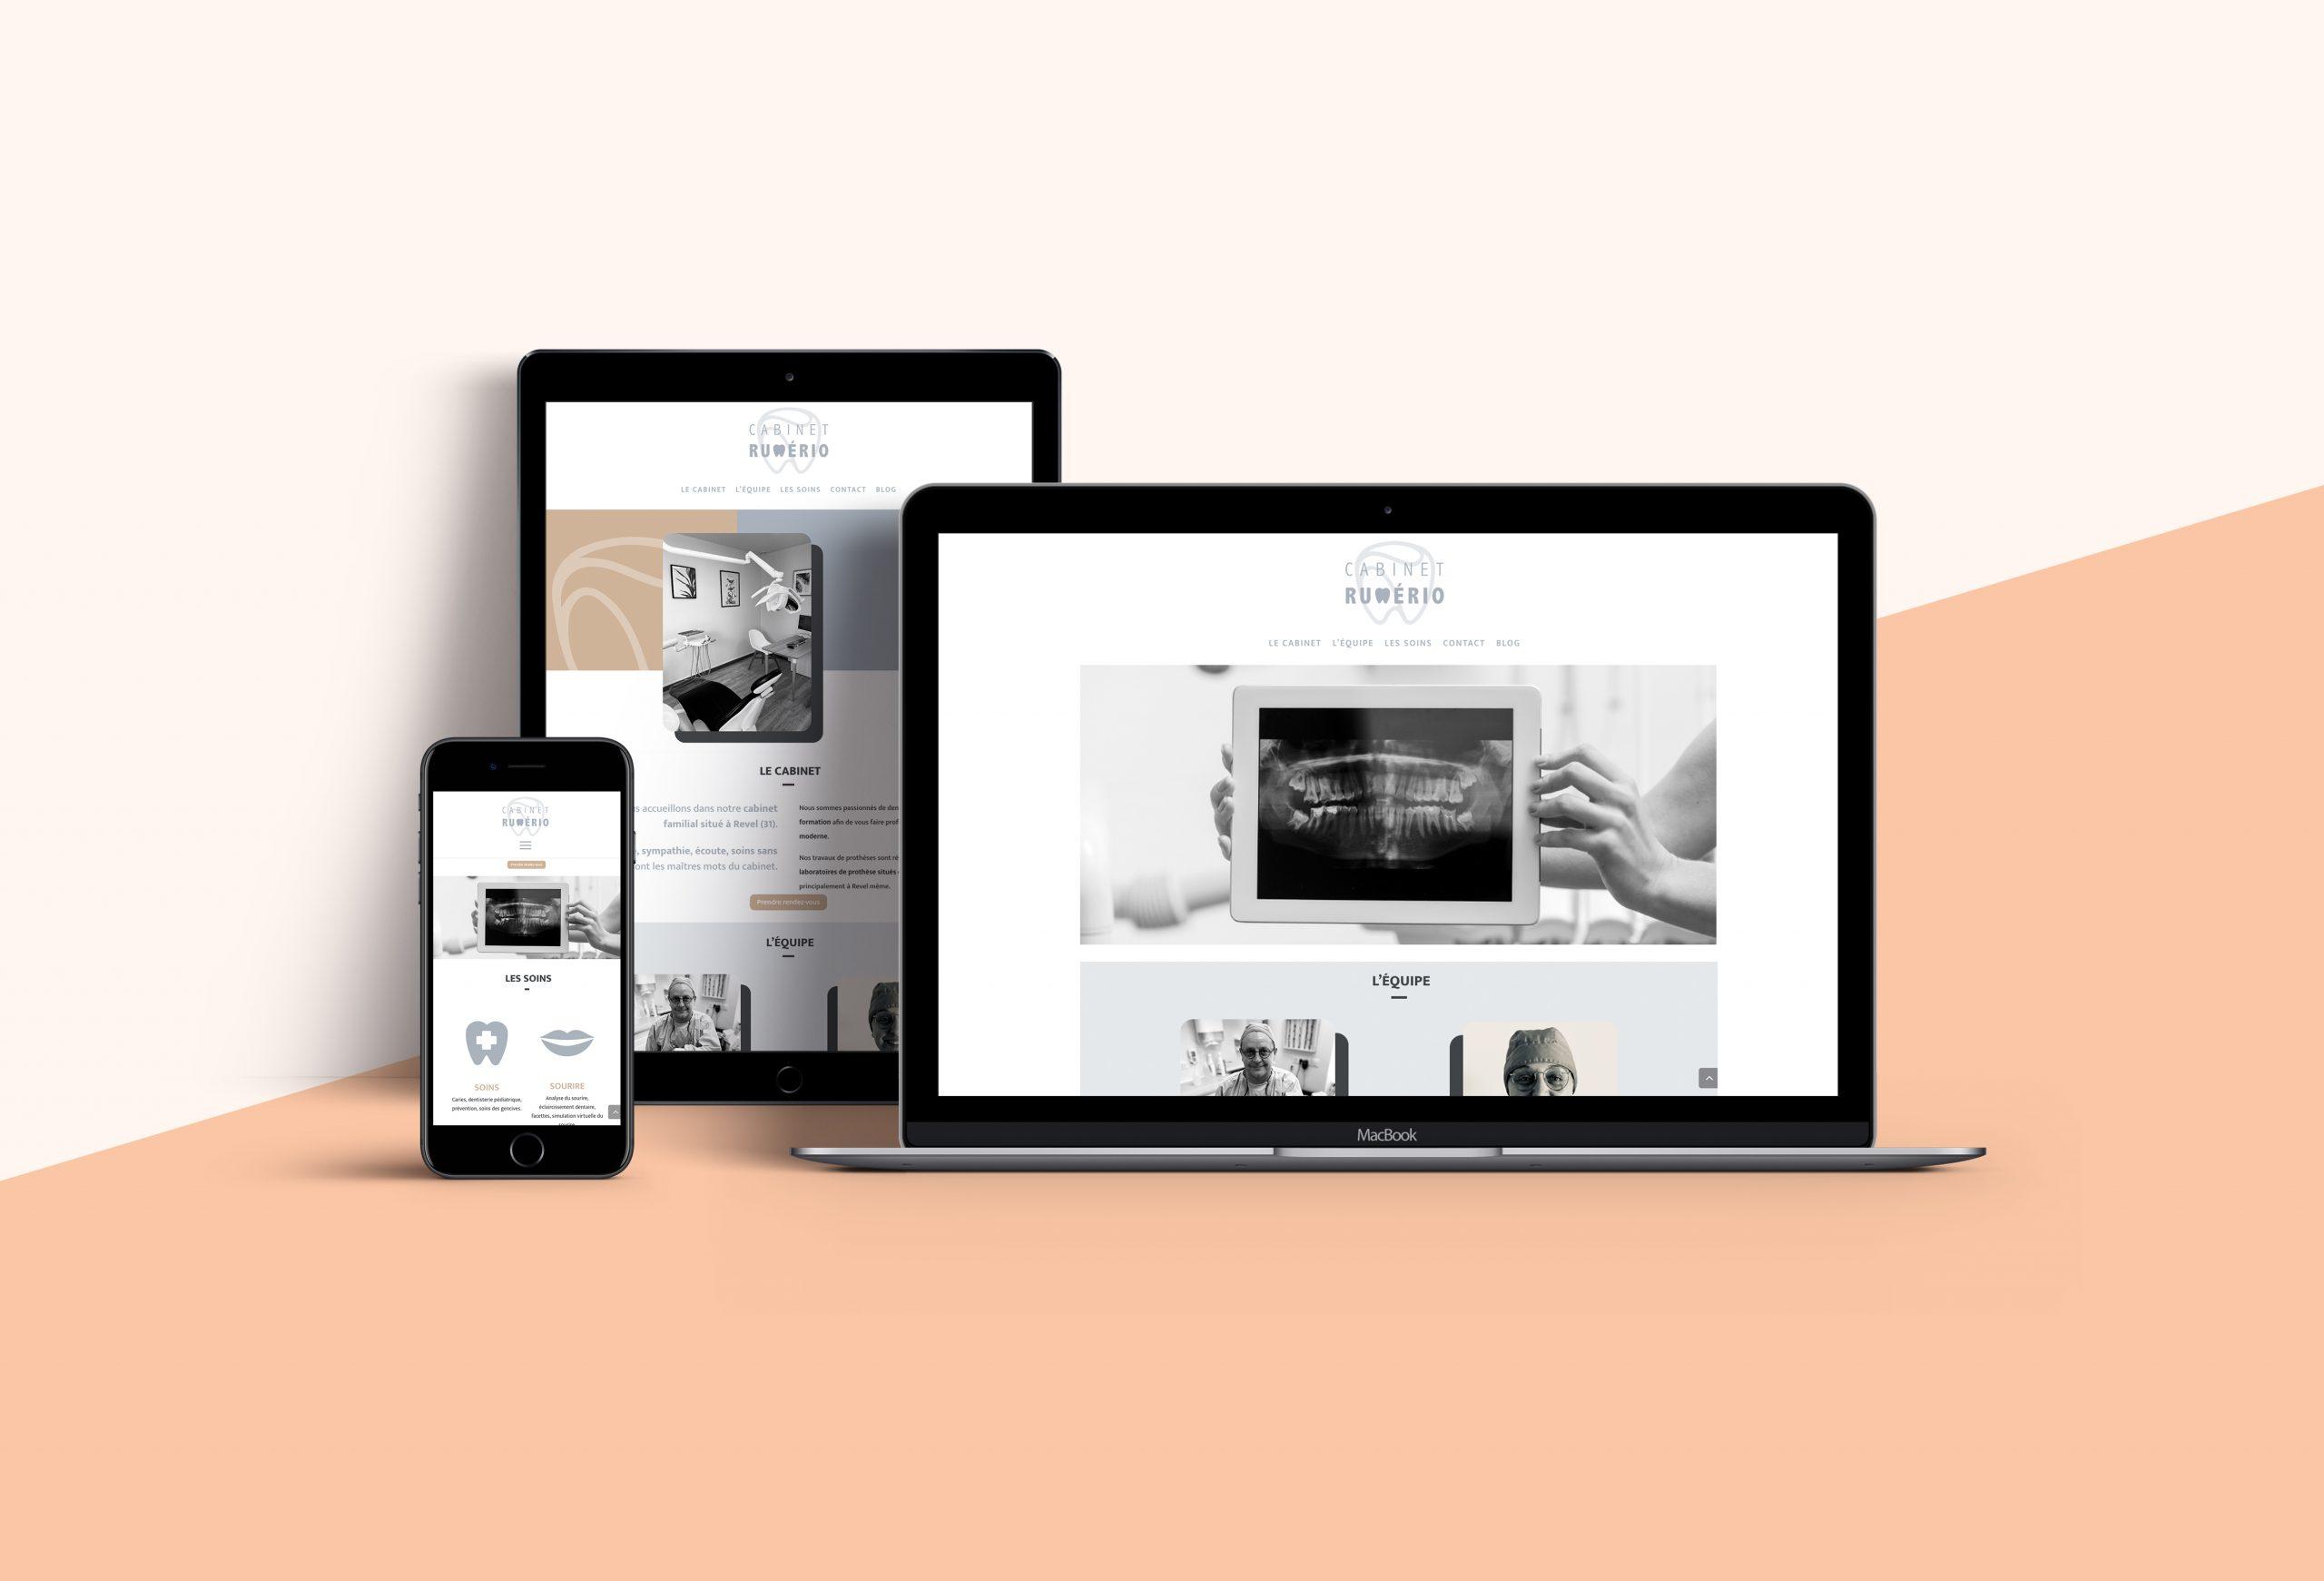 webdesign site Internet du cabinet Rumério